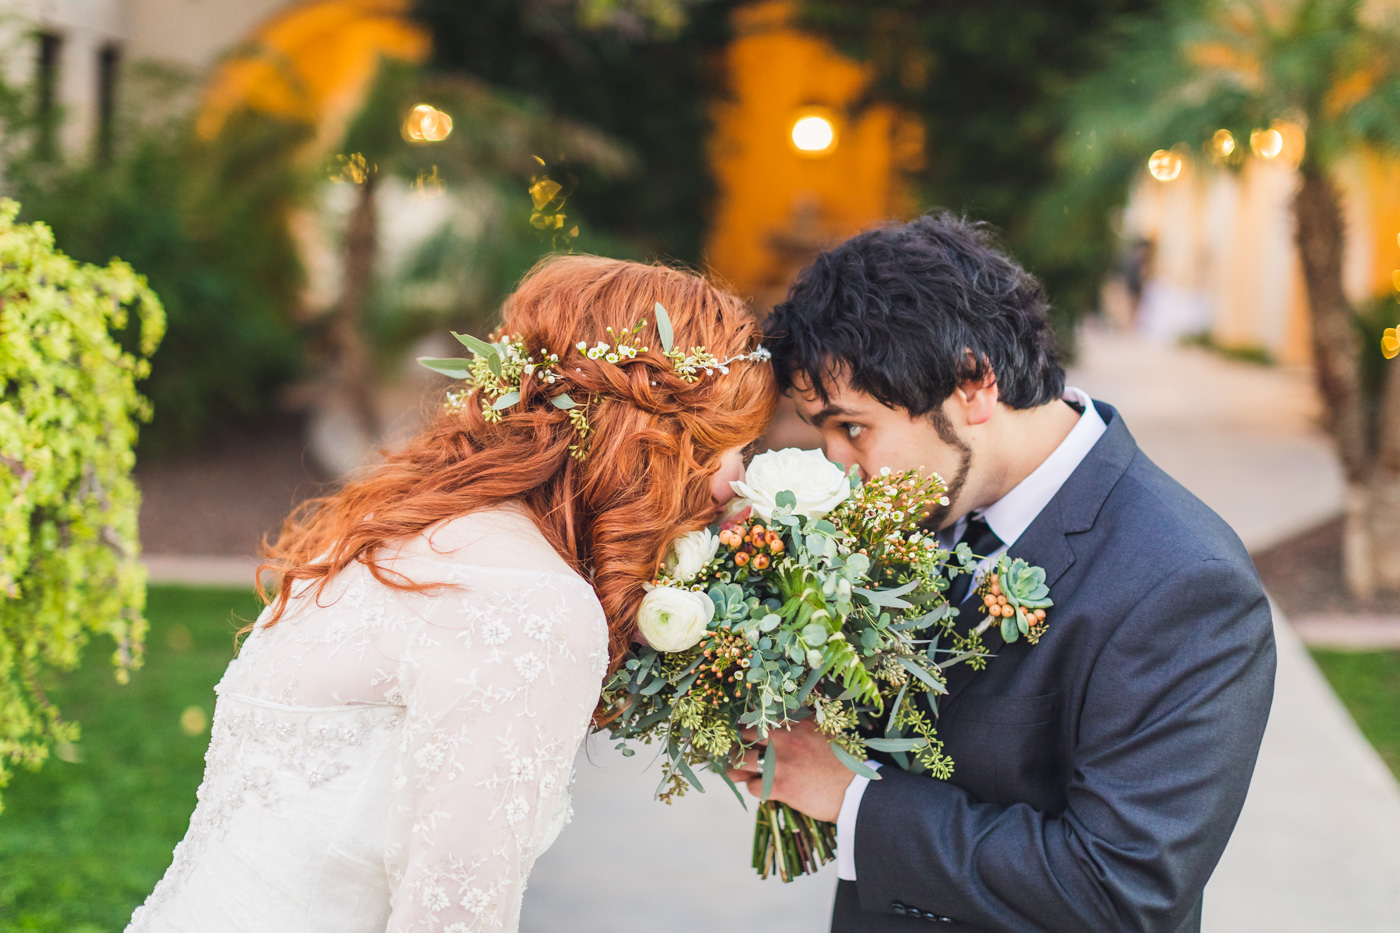 fun-bride-and-groom-portrait